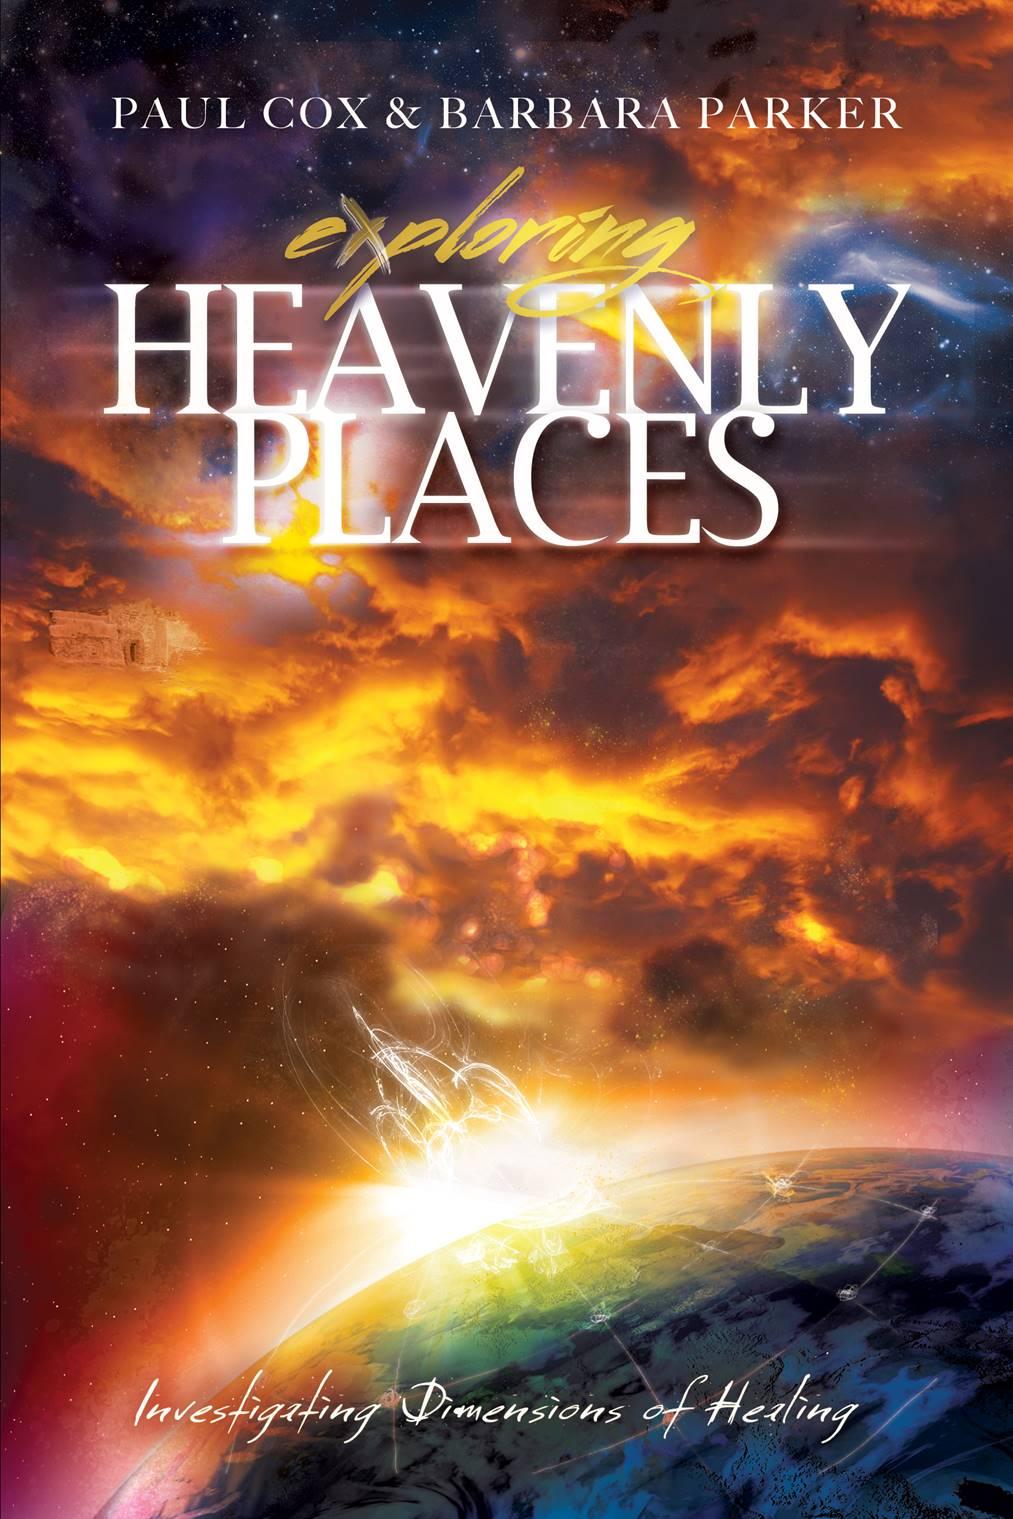 Exploring Heavenly Places Volume 1